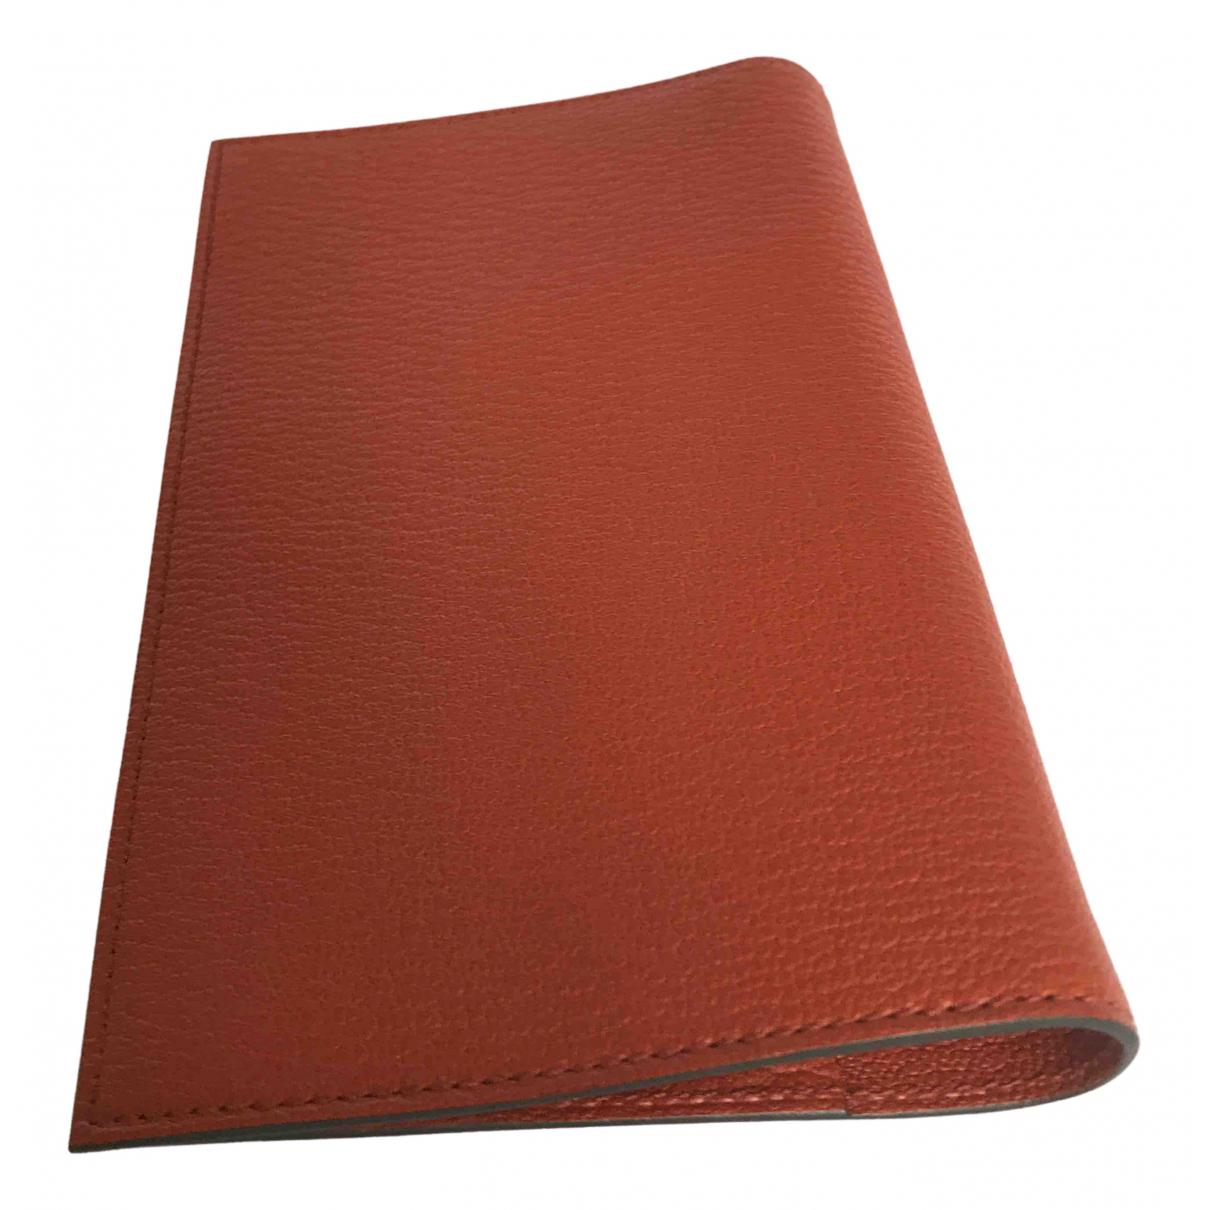 Hermès \N Orange Leather Purses, wallet & cases for Women \N